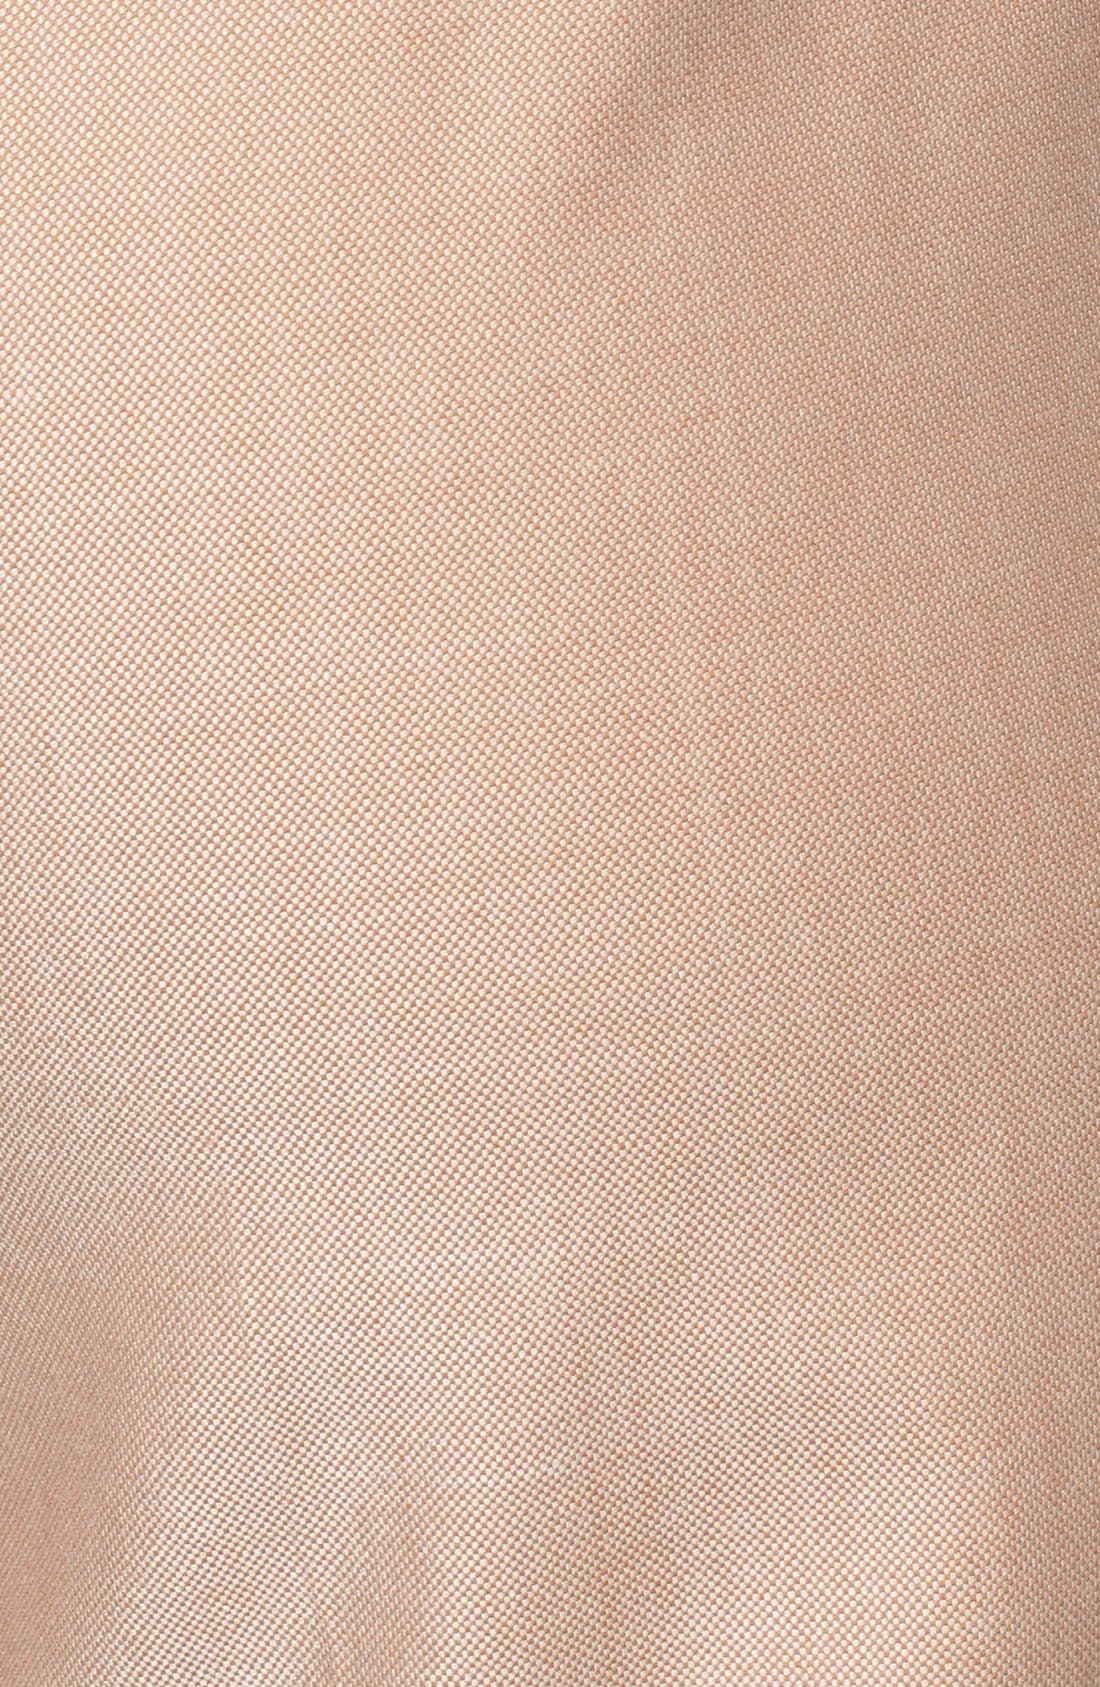 Alternate Image 3  - St. John Collection 'Emma' Straight Leg Suiting Pants